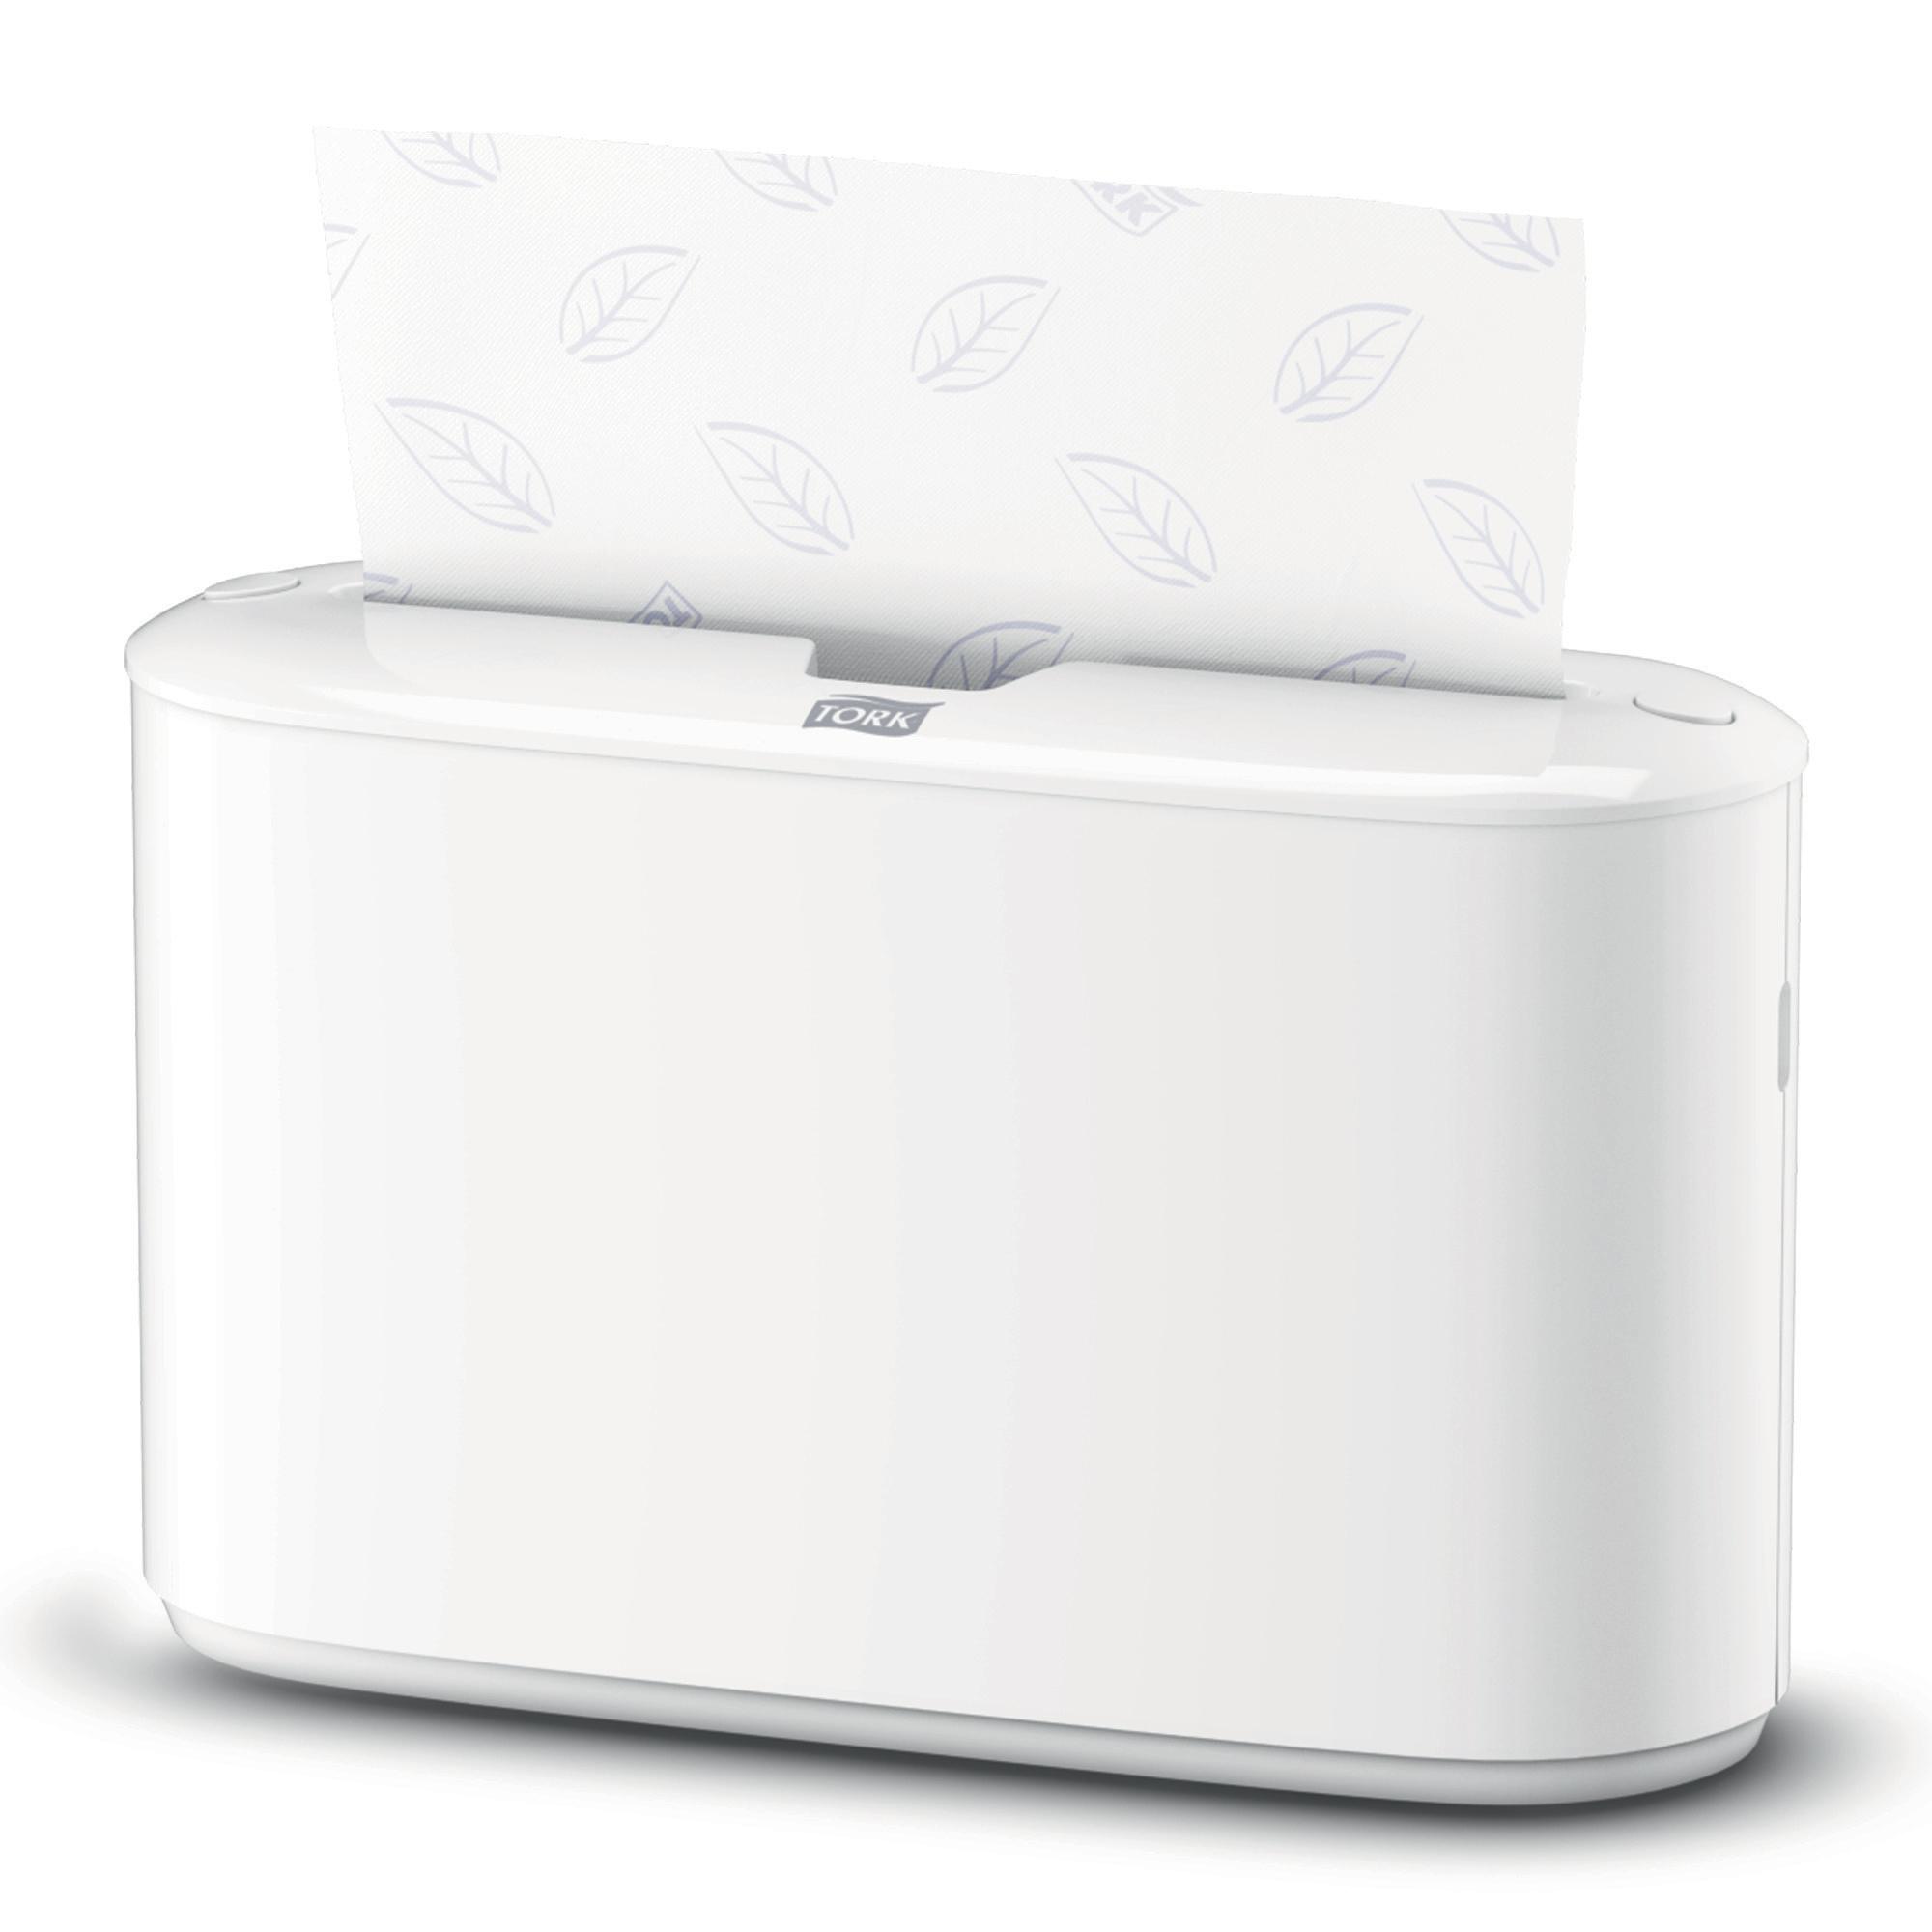 Tork Xpress Countertop Multifold Hand Towel Dispenser W274xD169xH382mm Plastic White Ref 552200